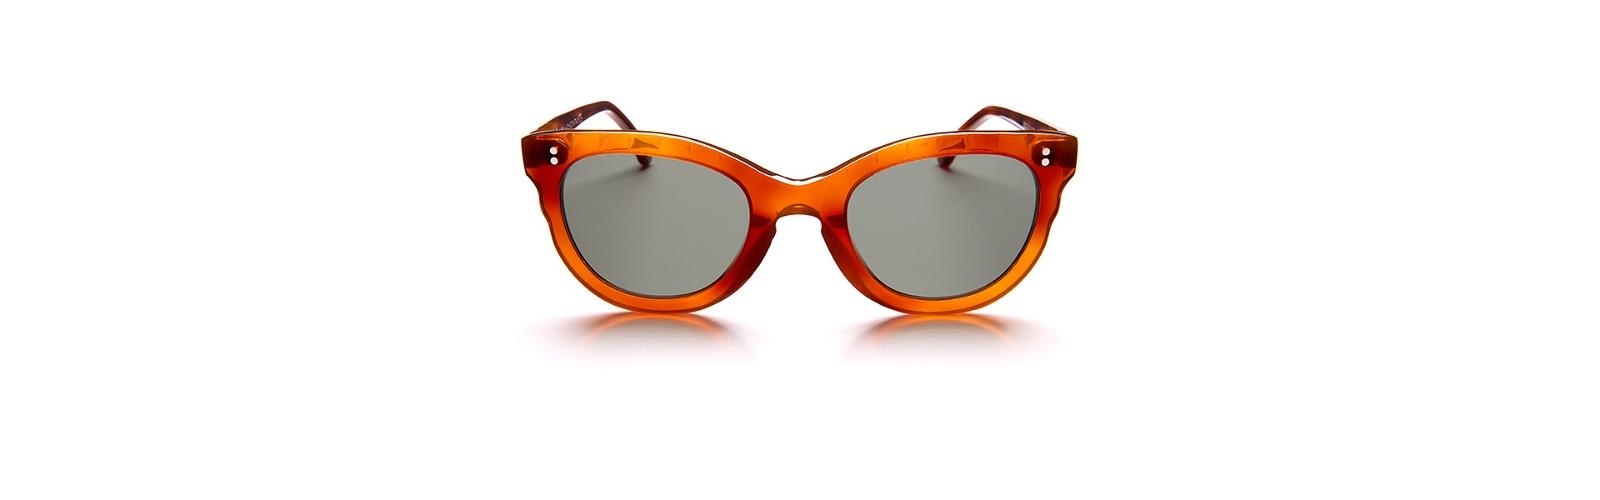 jamboree sunglasses brooklyn Dark Tortoise